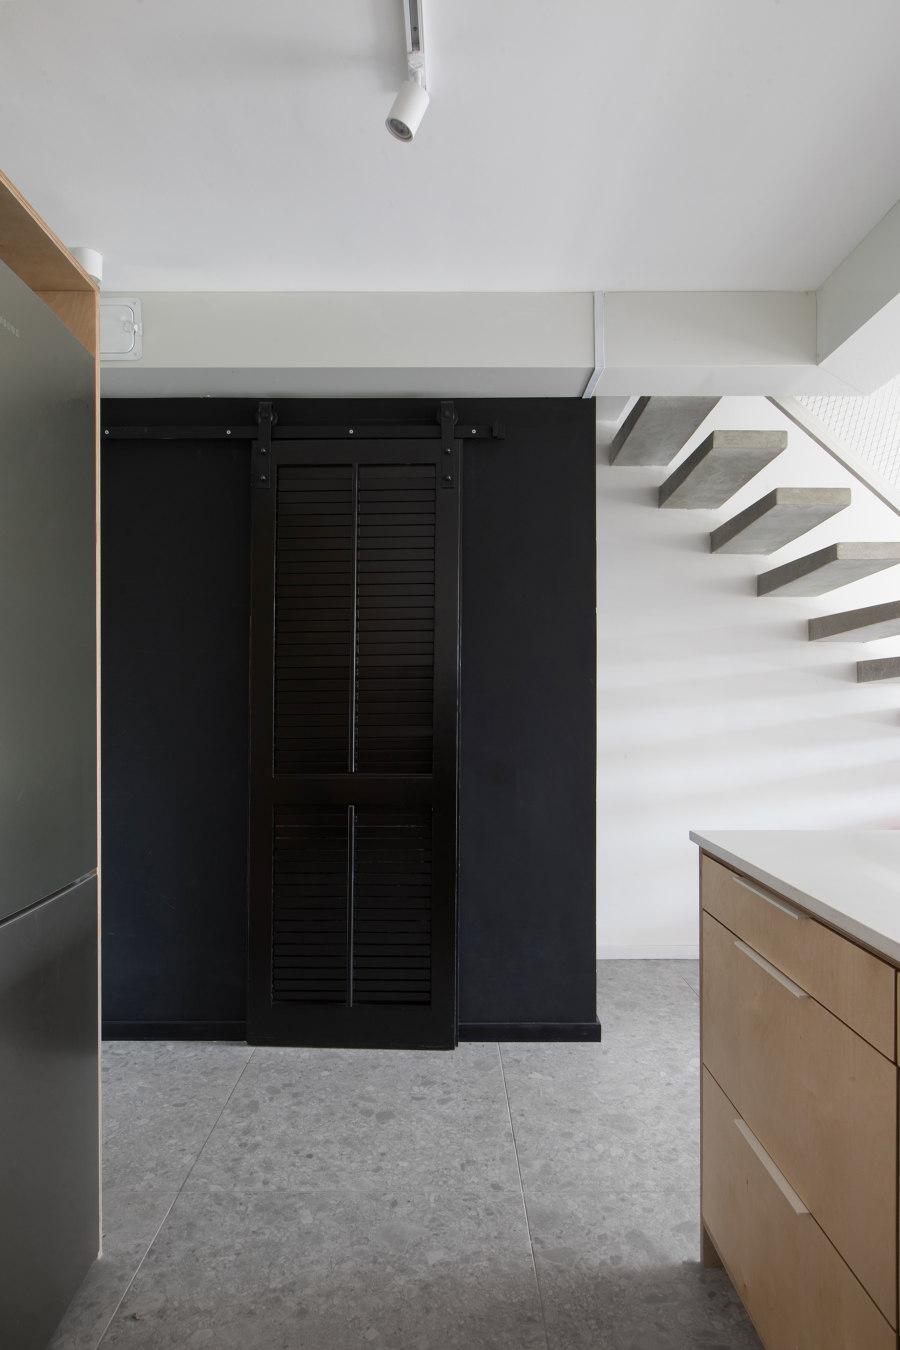 Hofain St by Dafna Gravinsky | Living space